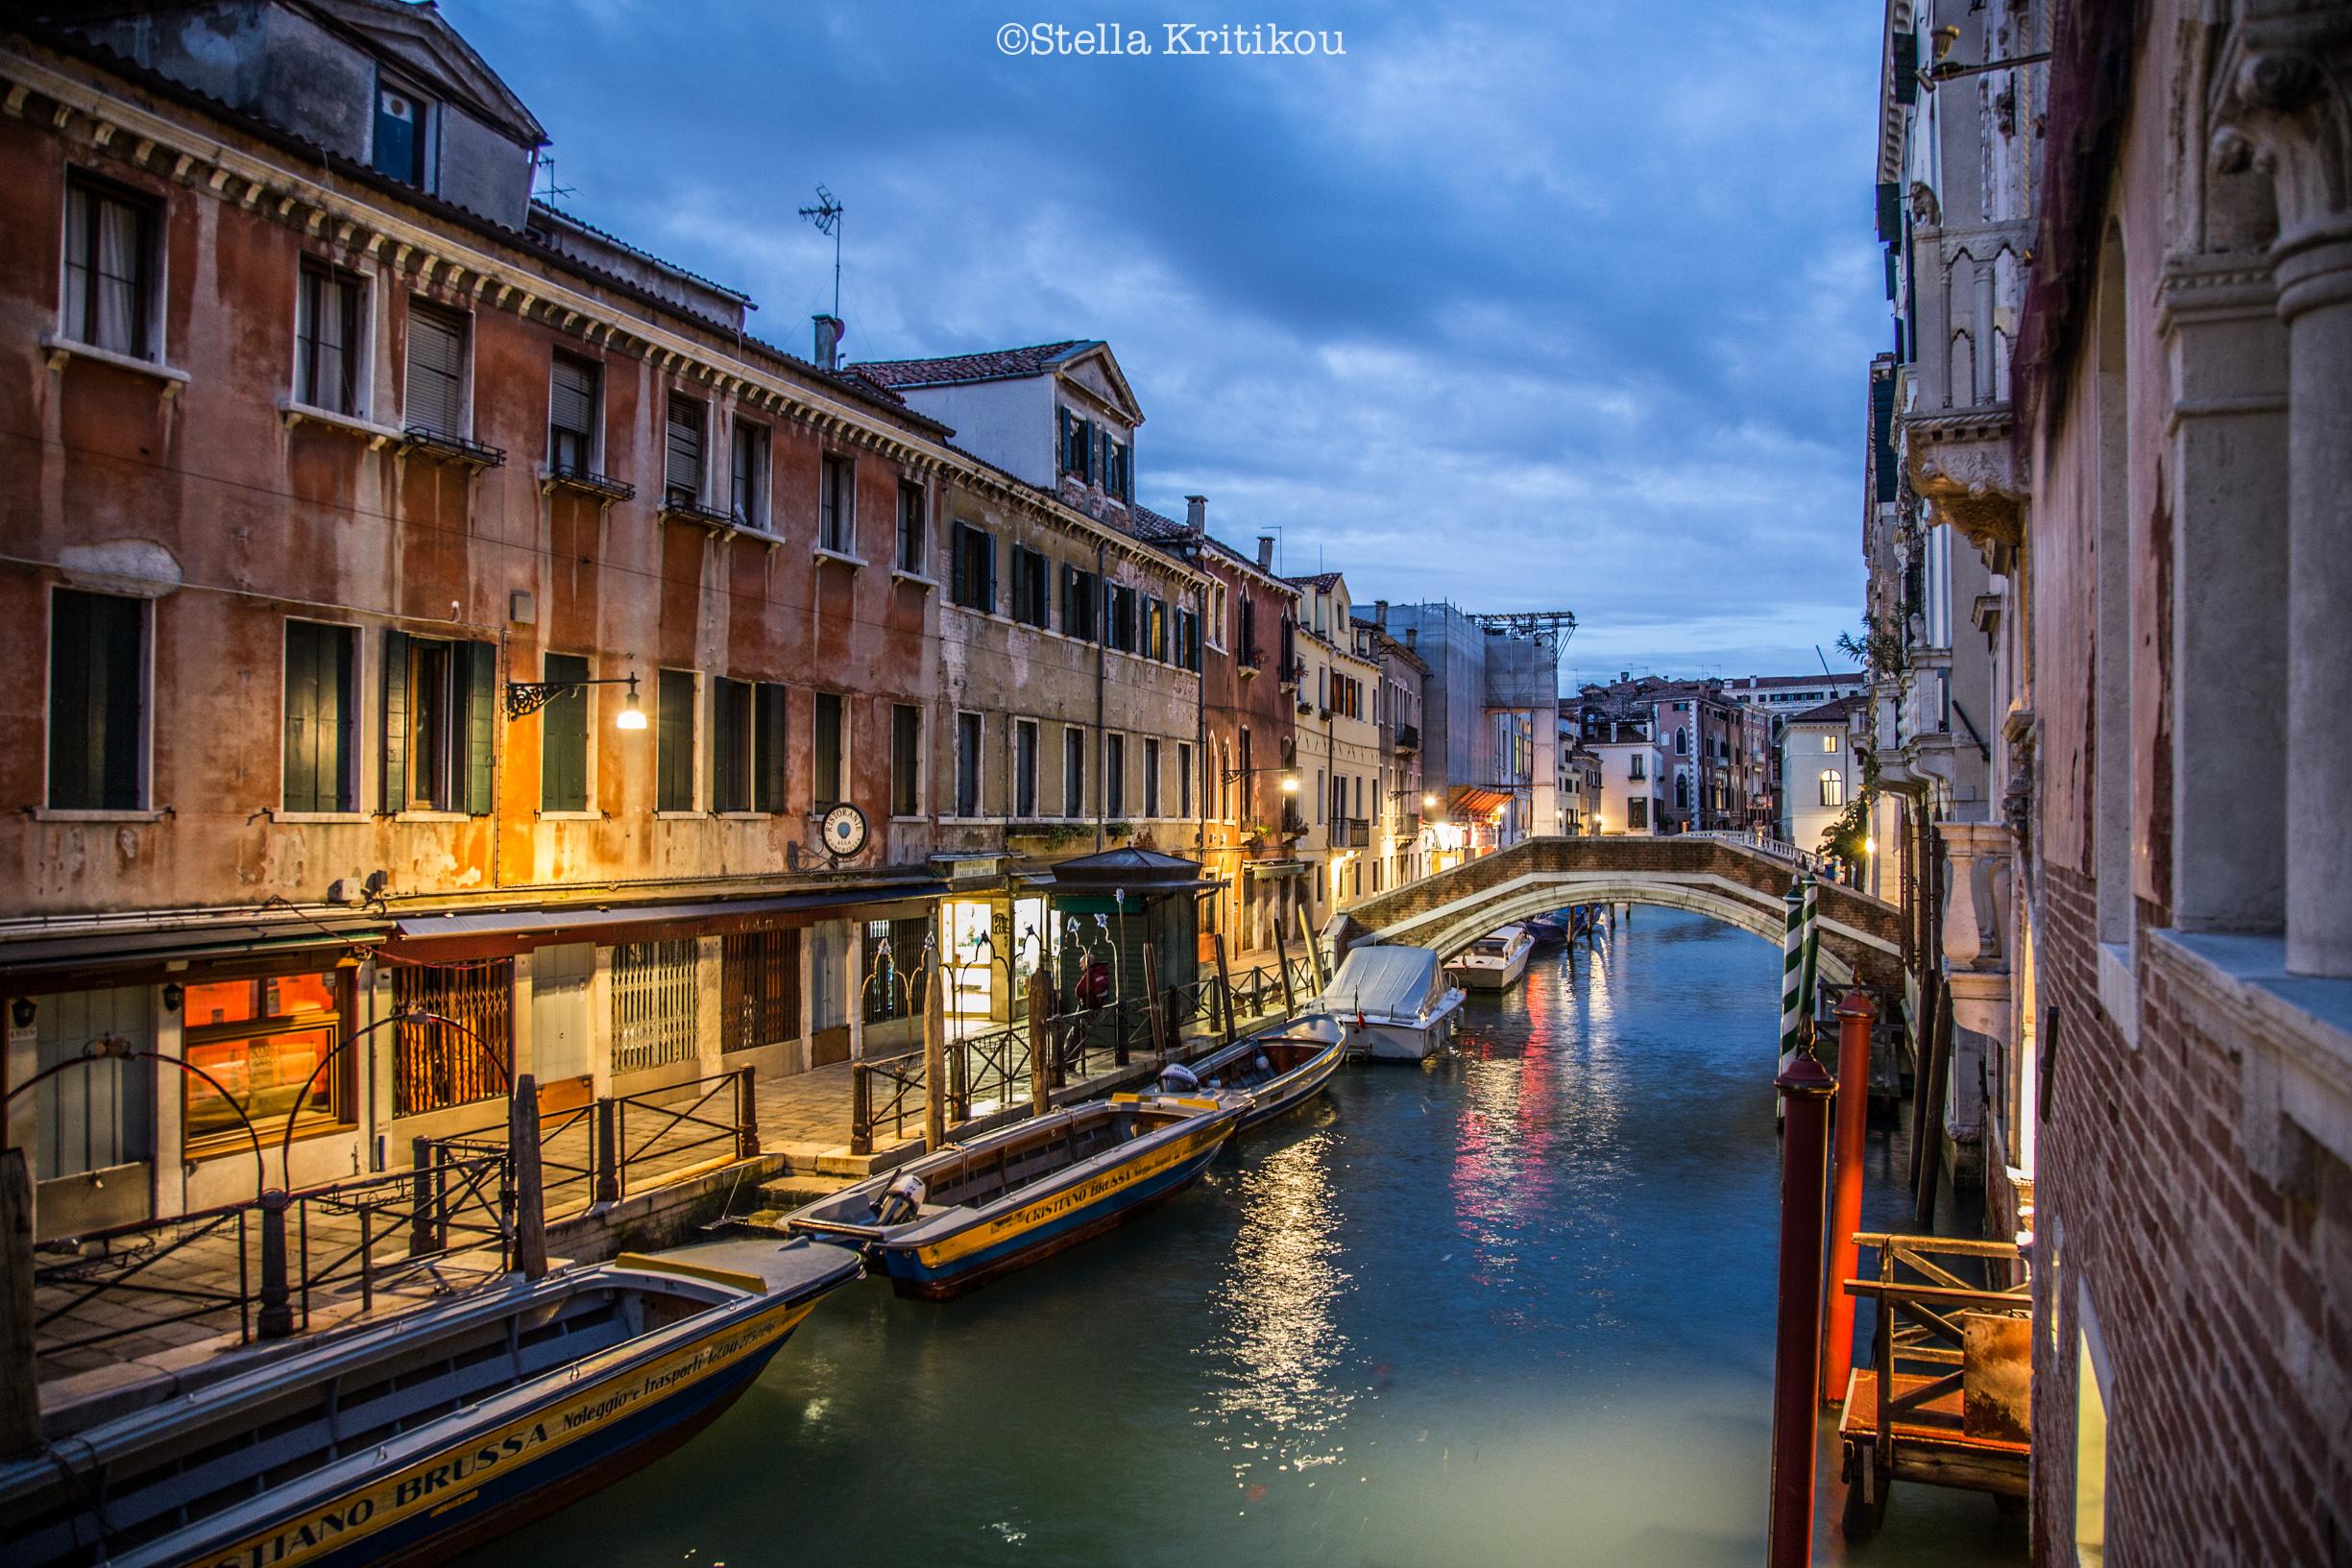 Stella Kritikou Venice 3.jpg